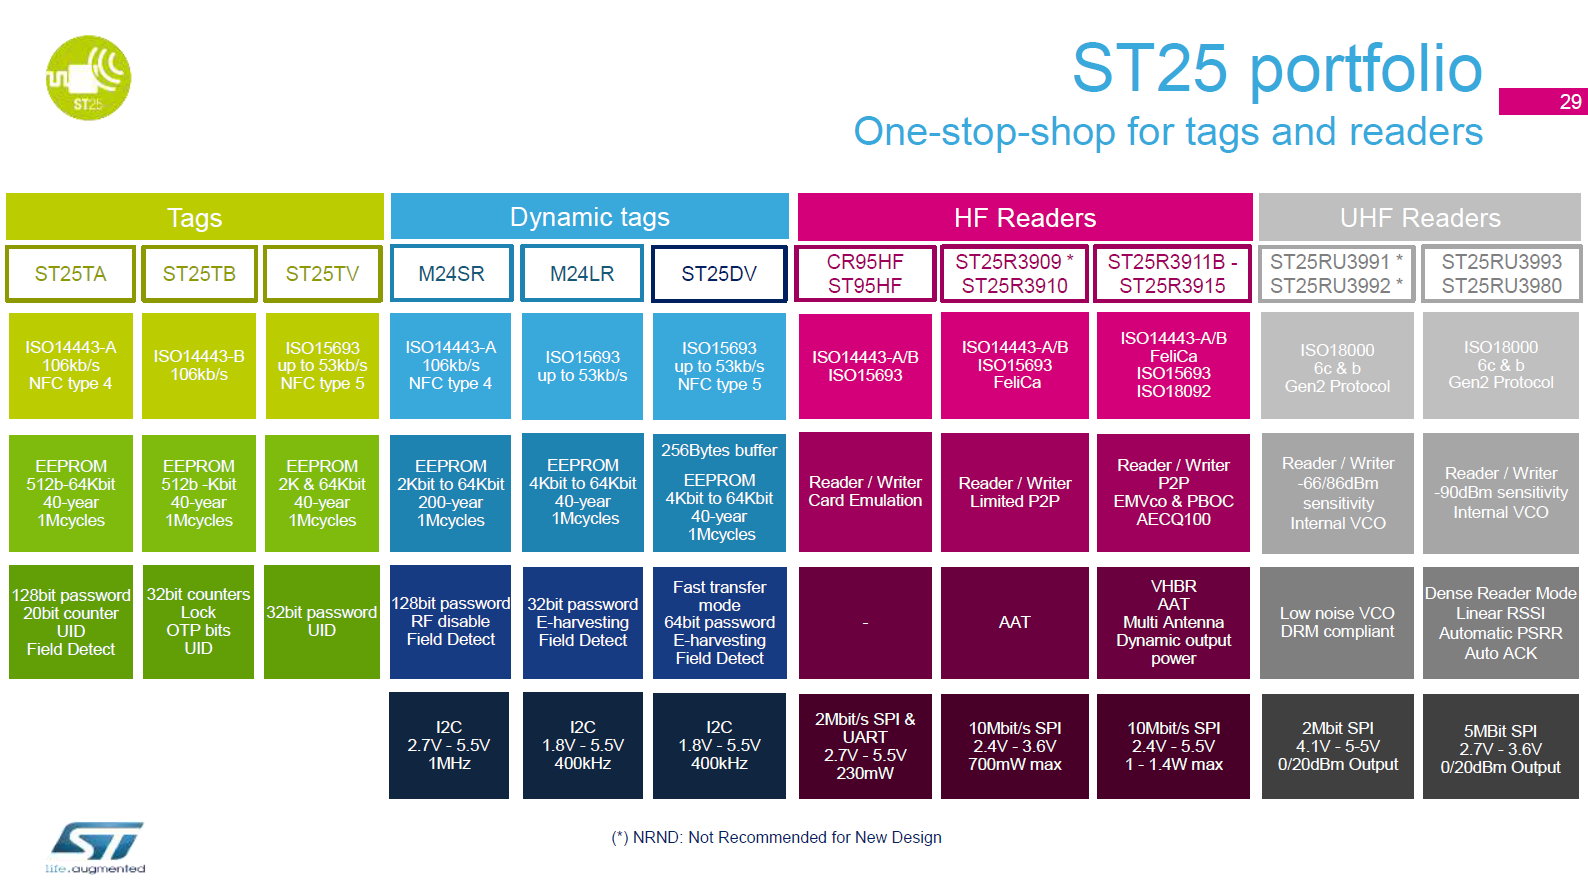 ST25 portfolio